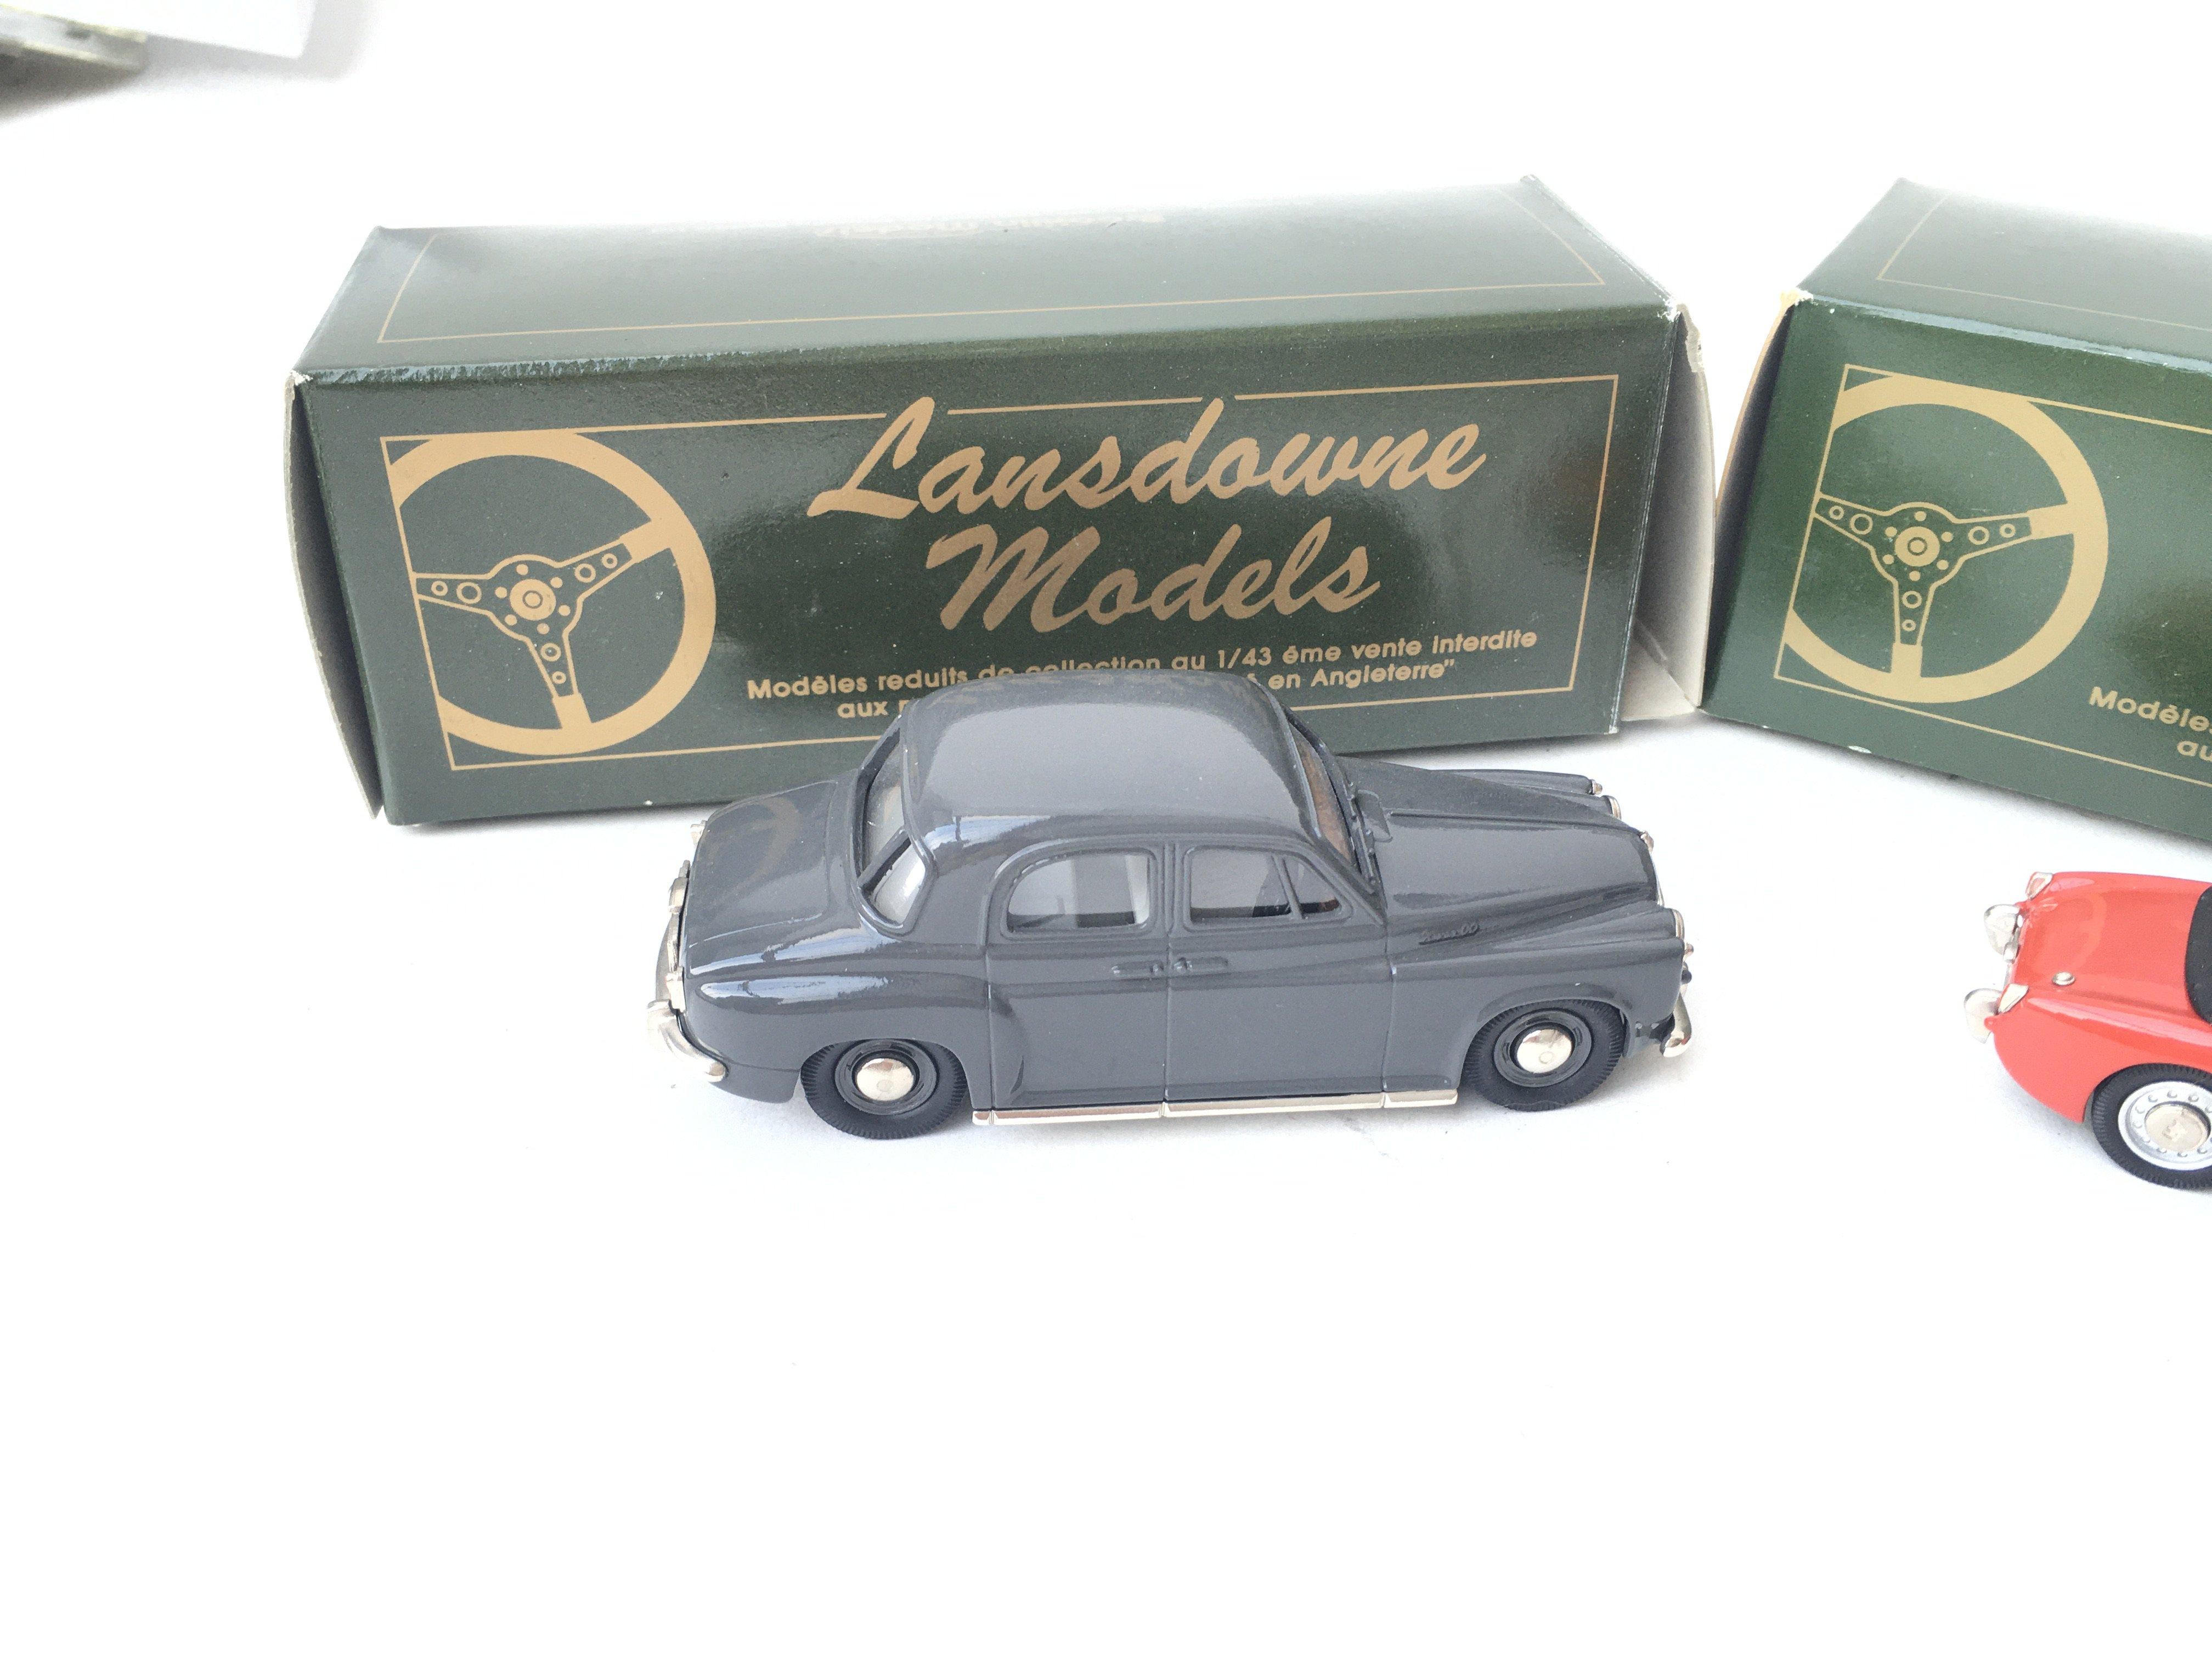 2 X Lansdowne Models including LDM.5 1957 Rover P4 - Image 2 of 3